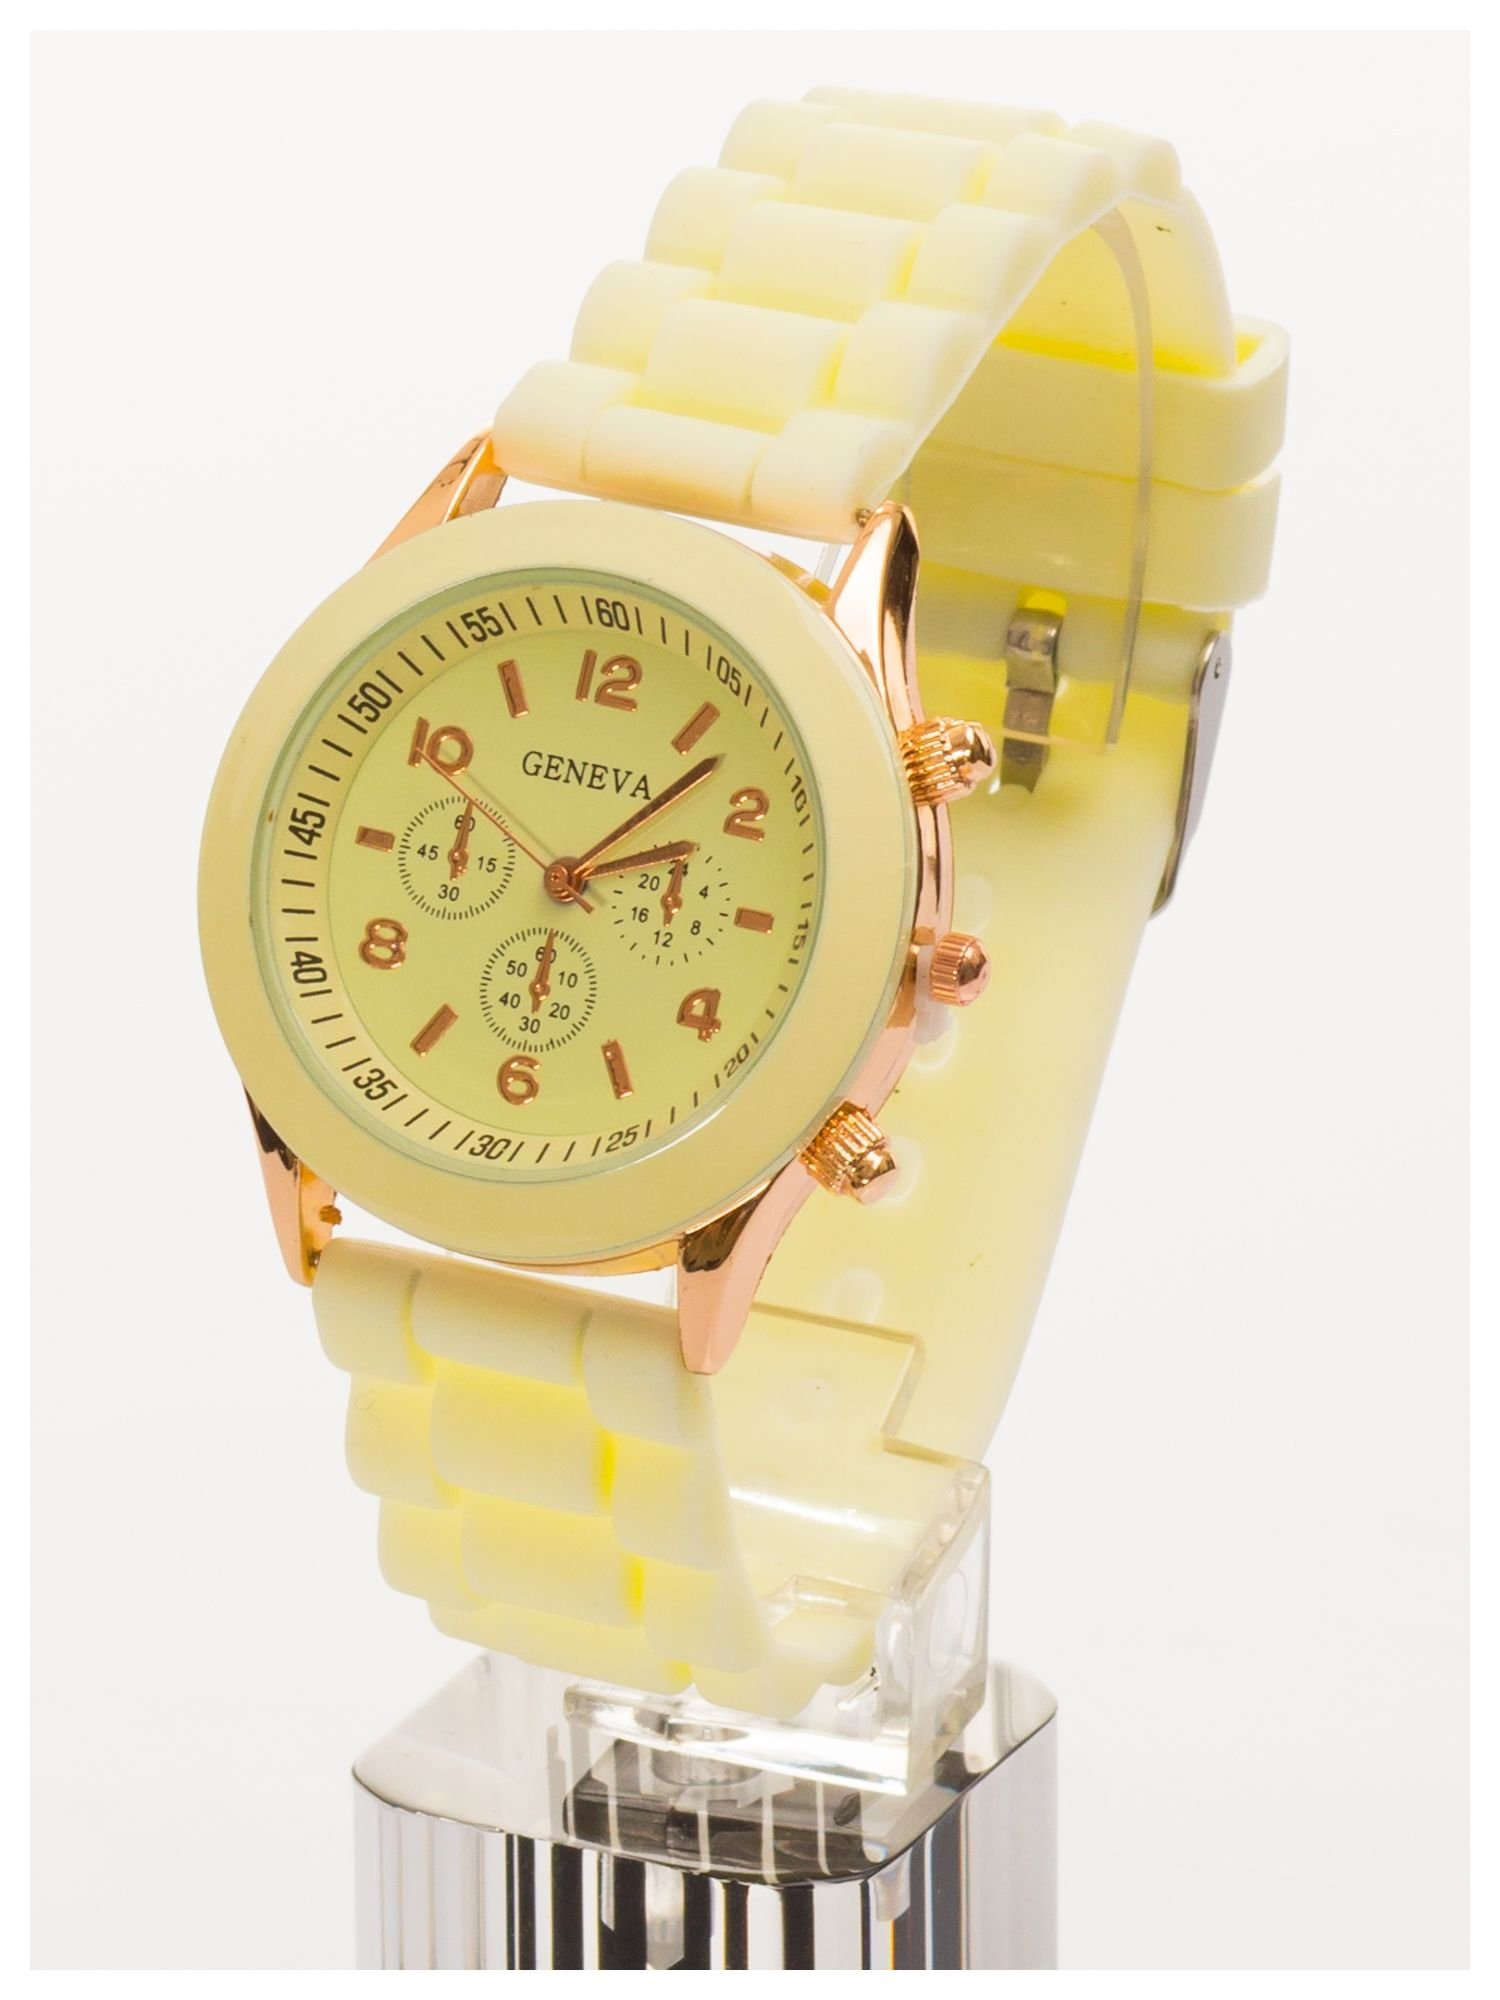 GENEVA Ecru zegarek damski na silikonowym pasku                                  zdj.                                  3